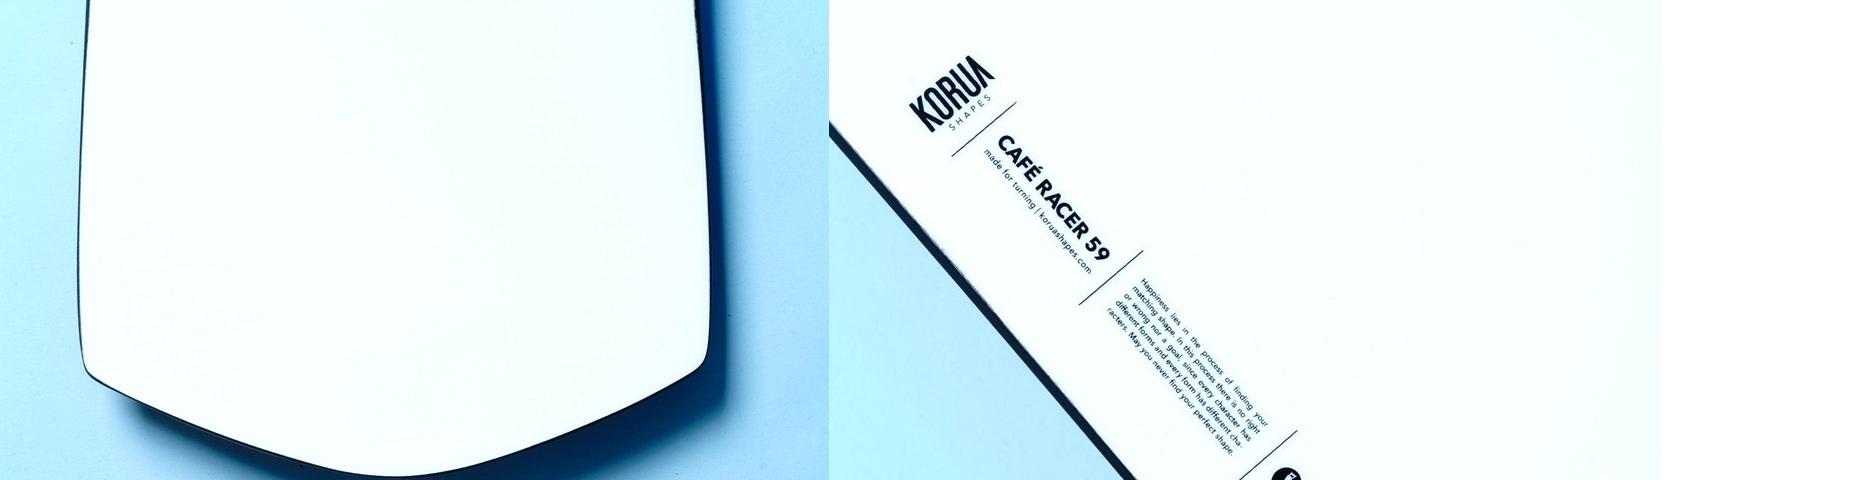 snowboard-details-korua-cafe-racer